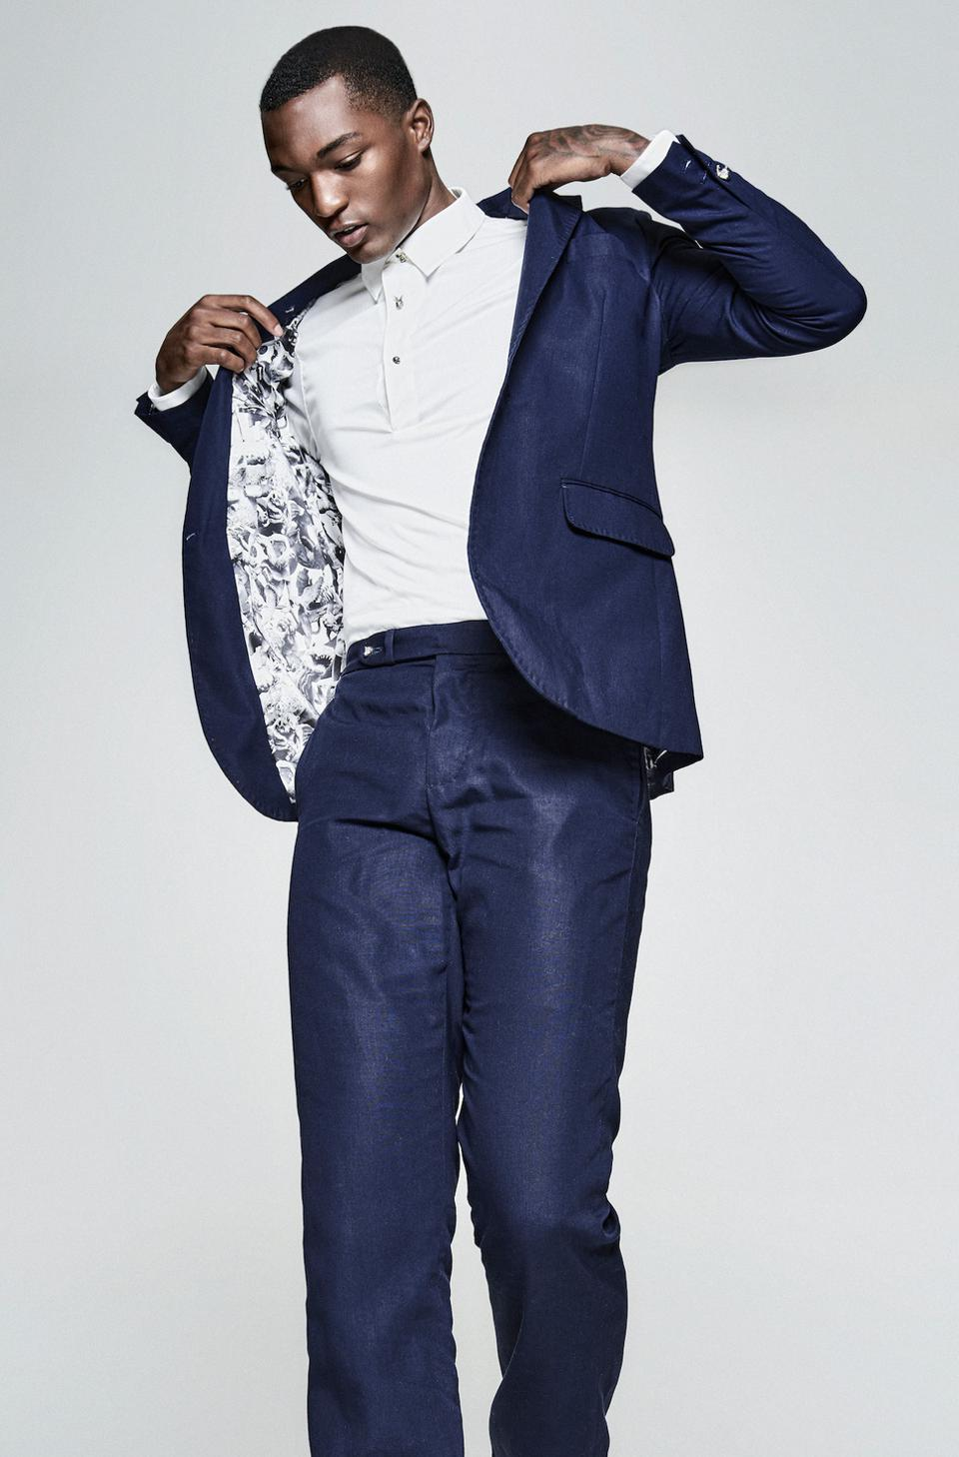 Lightweight Navy Suit